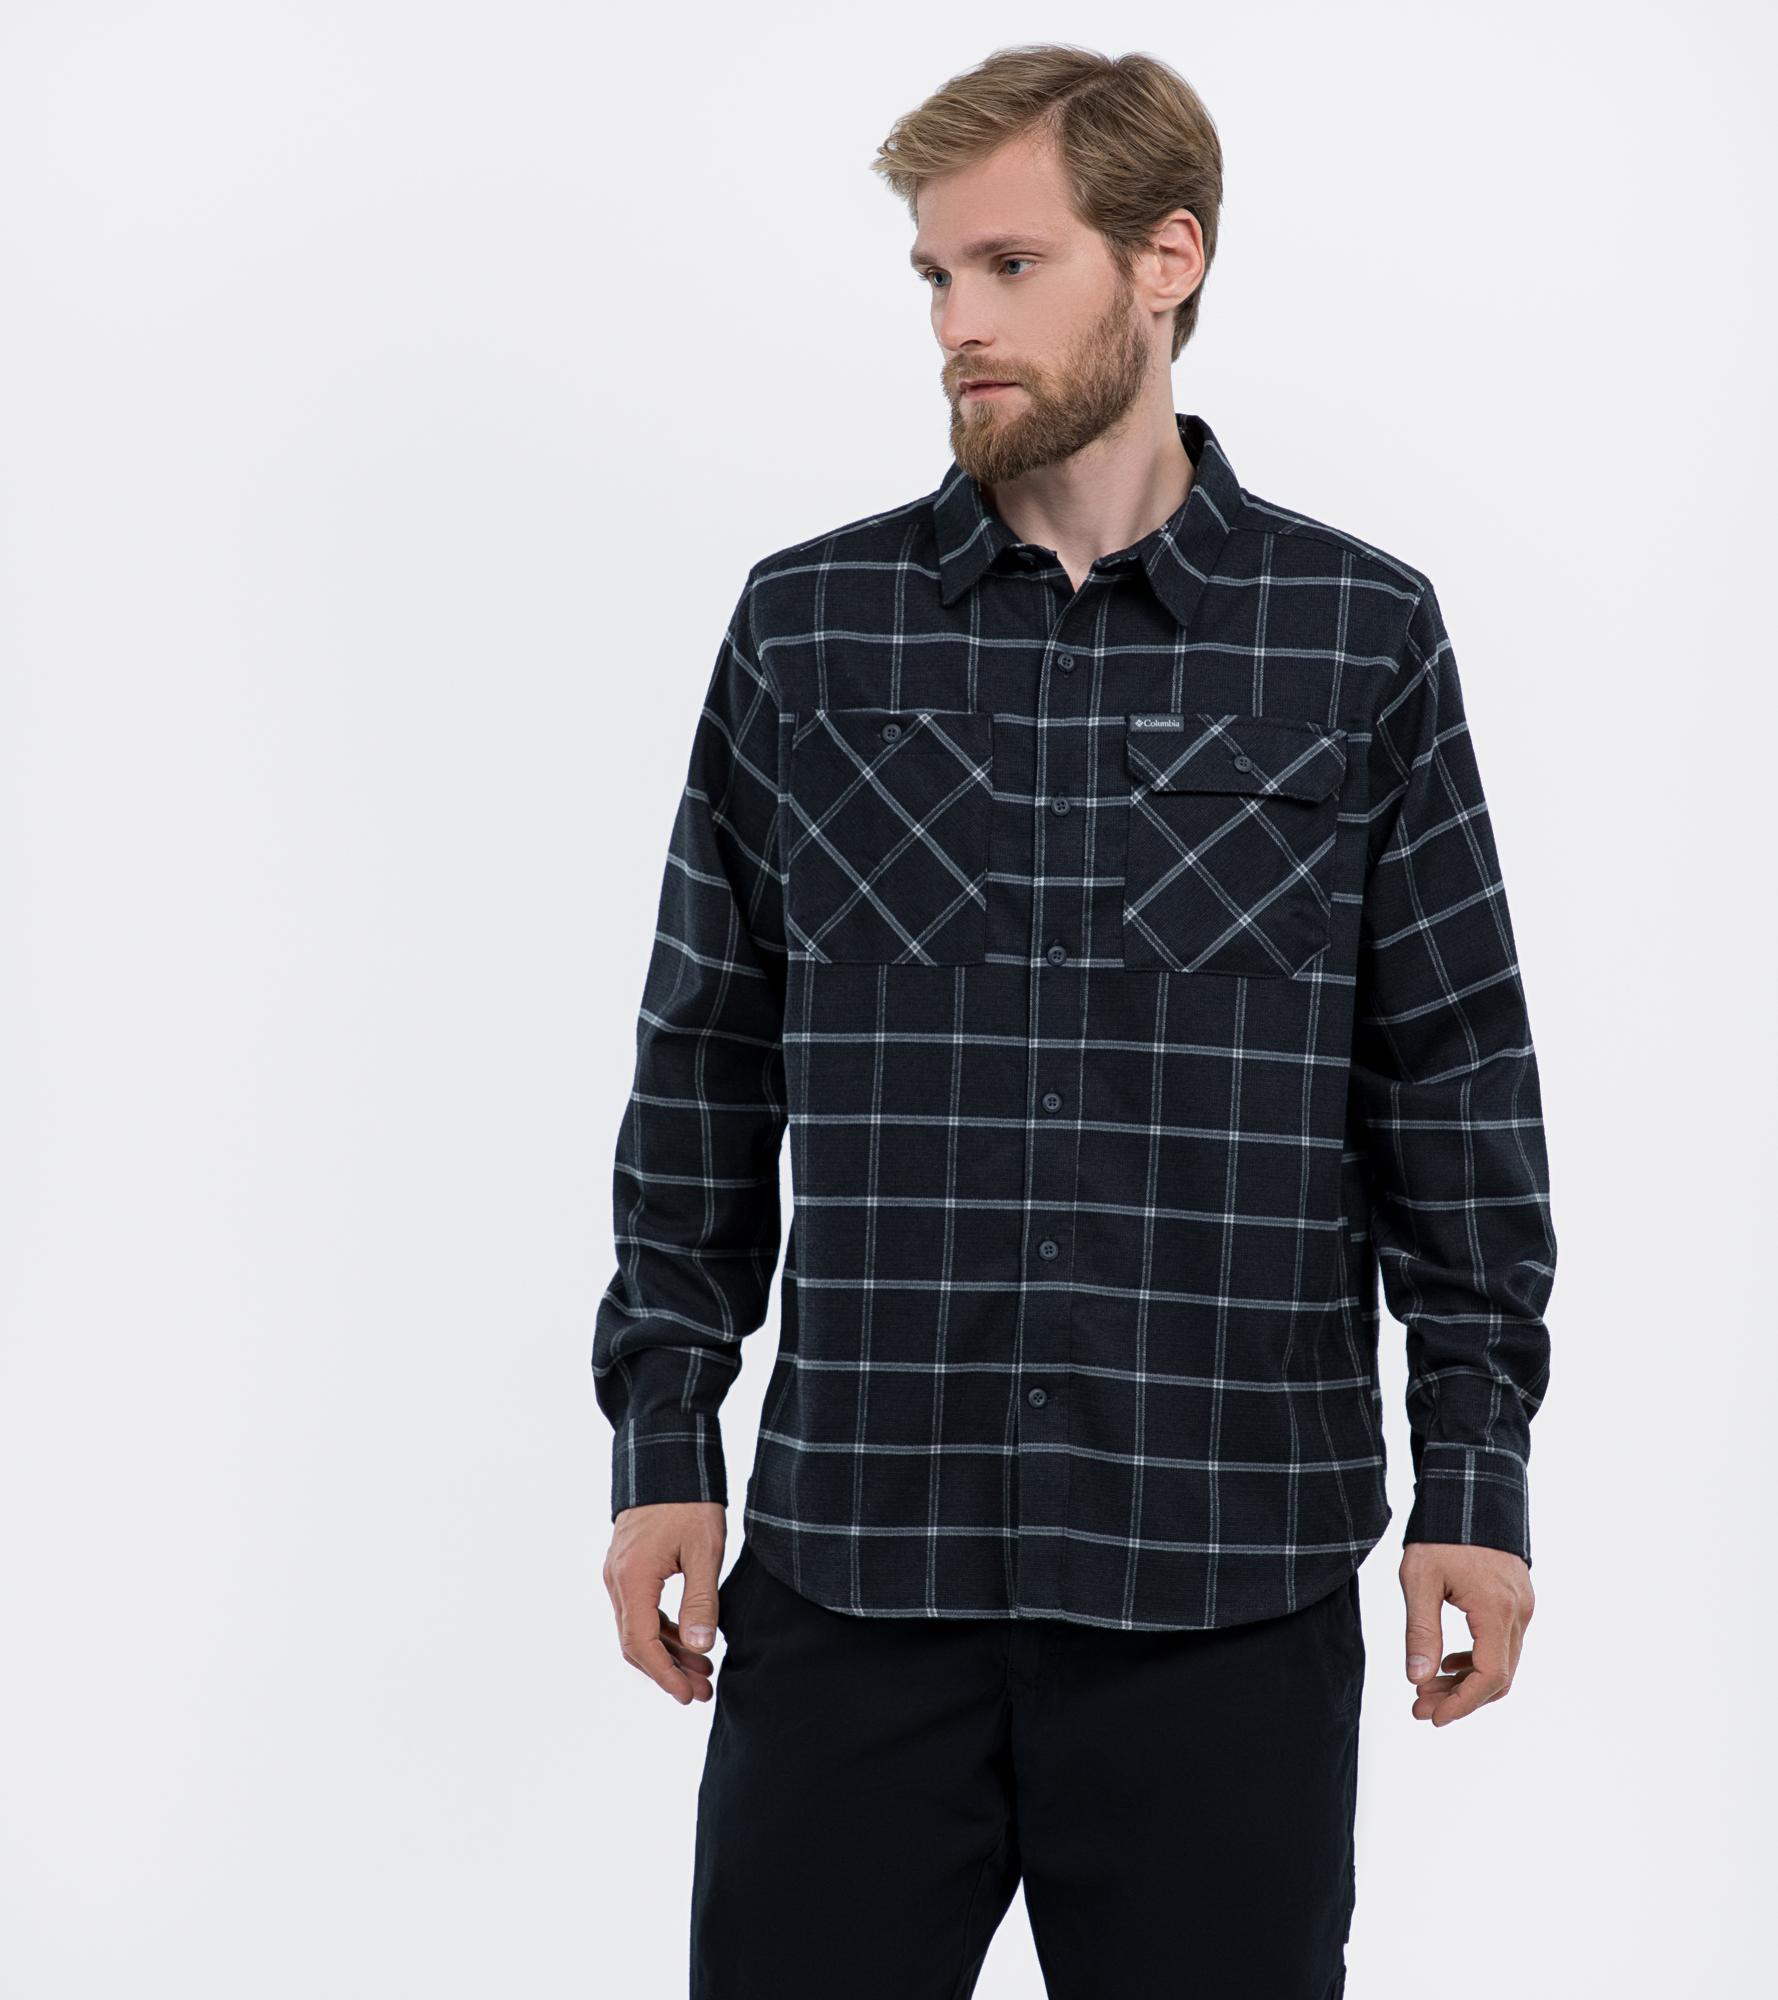 Columbia Рубашка мужская Outdoor Elements, размер 56-58